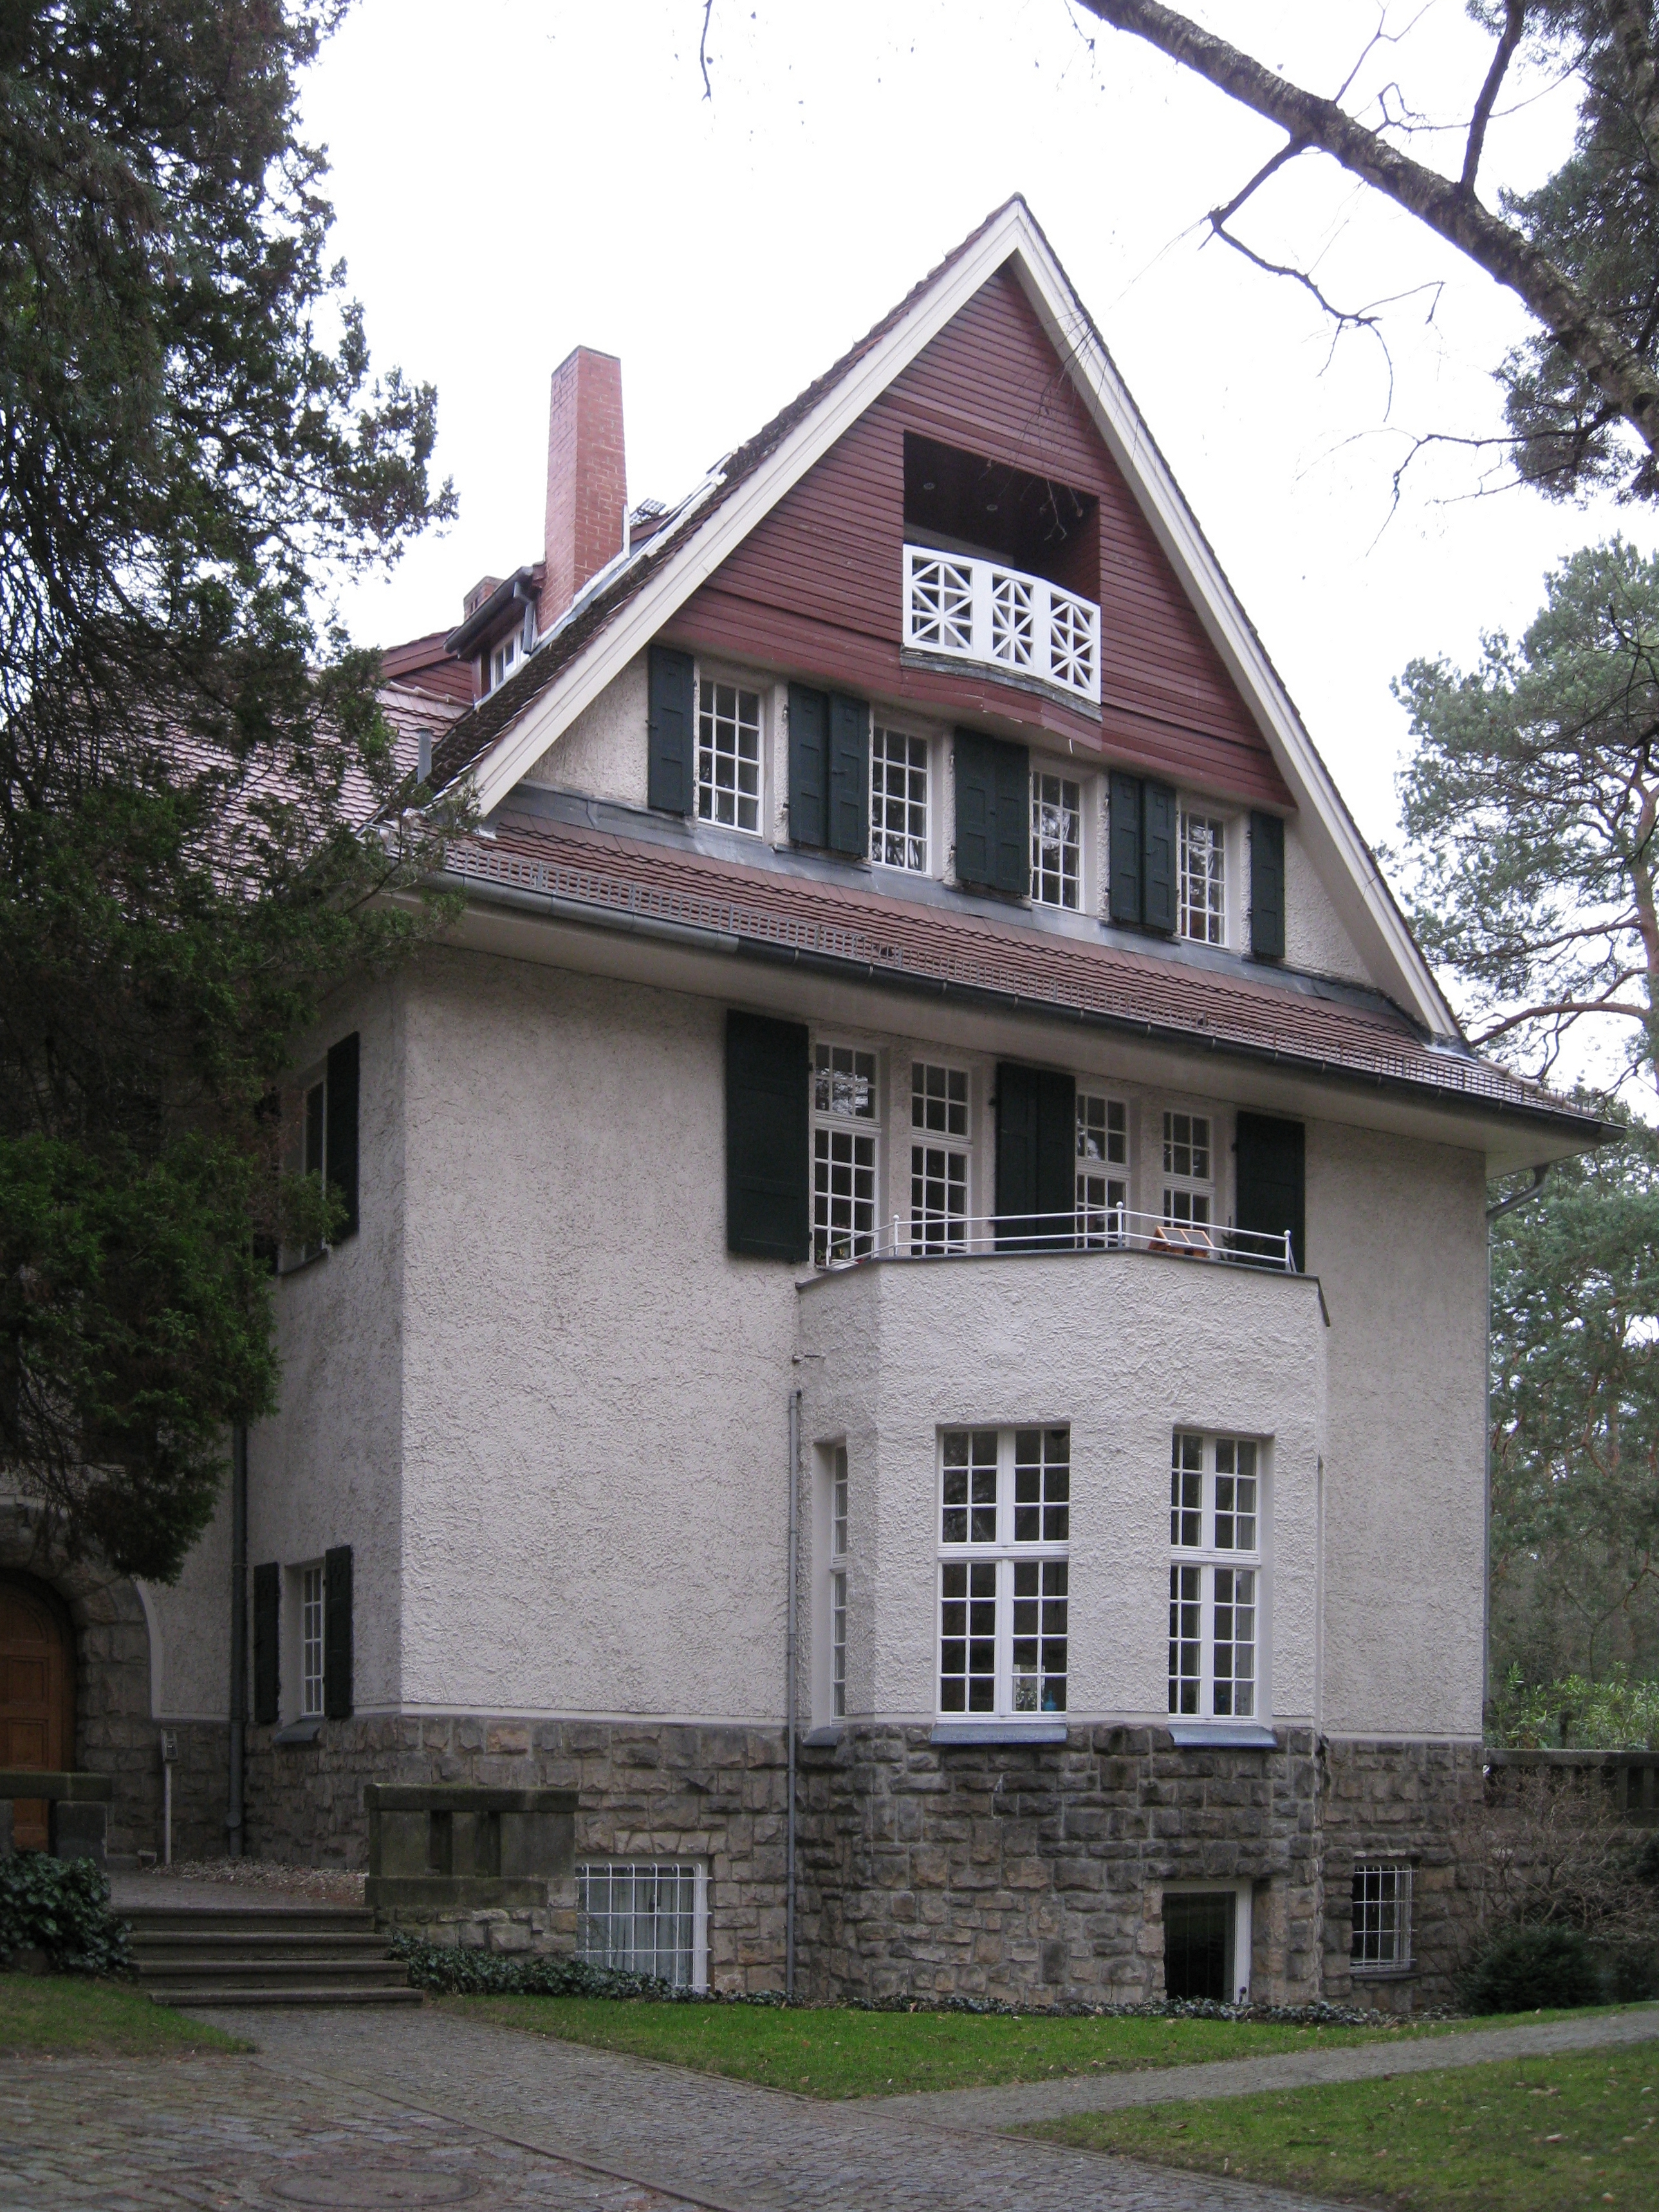 Villa Dahlem villa dahlem kerstin musl harvest celebration at domne dahlem